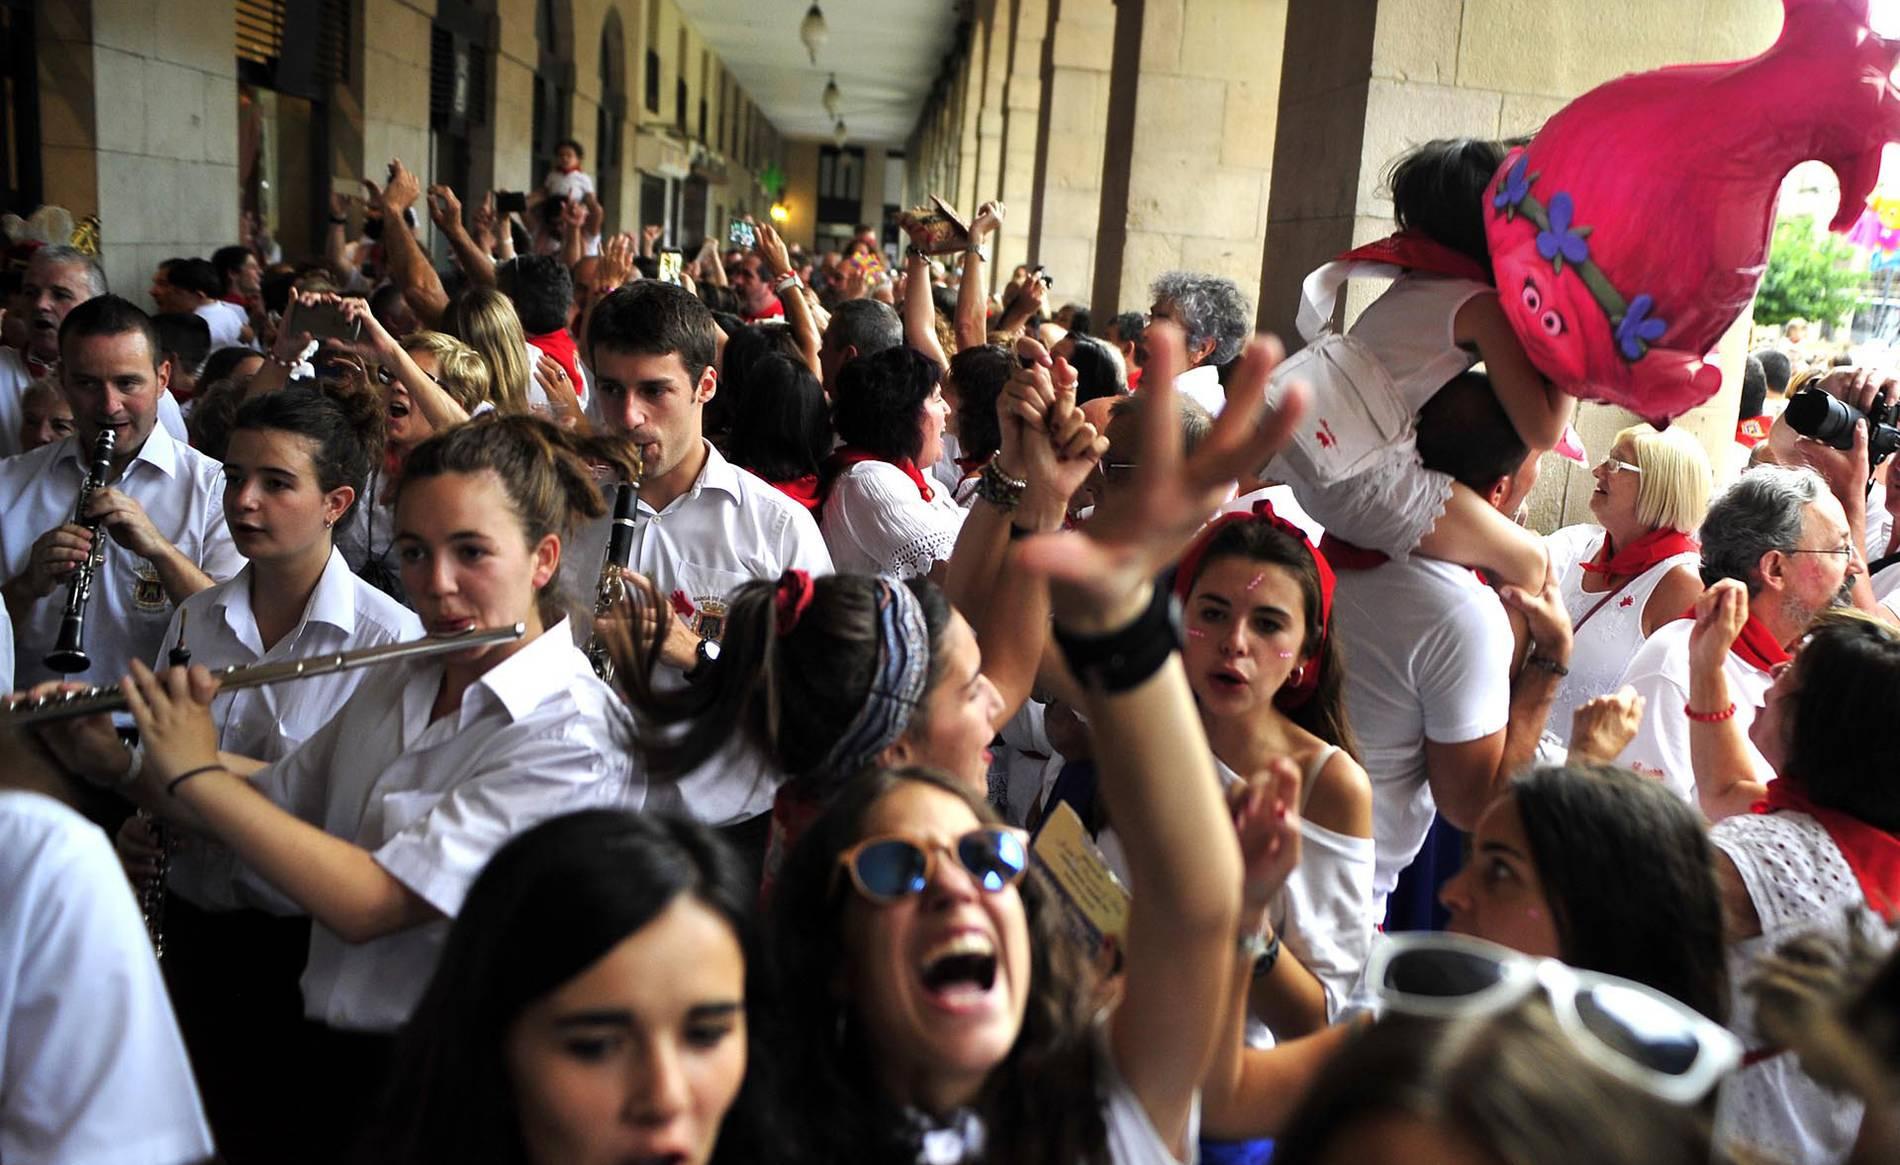 La Salve en fiestas de Tafalla (1/18) - Fiestas de Tafalla 2017 - Contenidos -